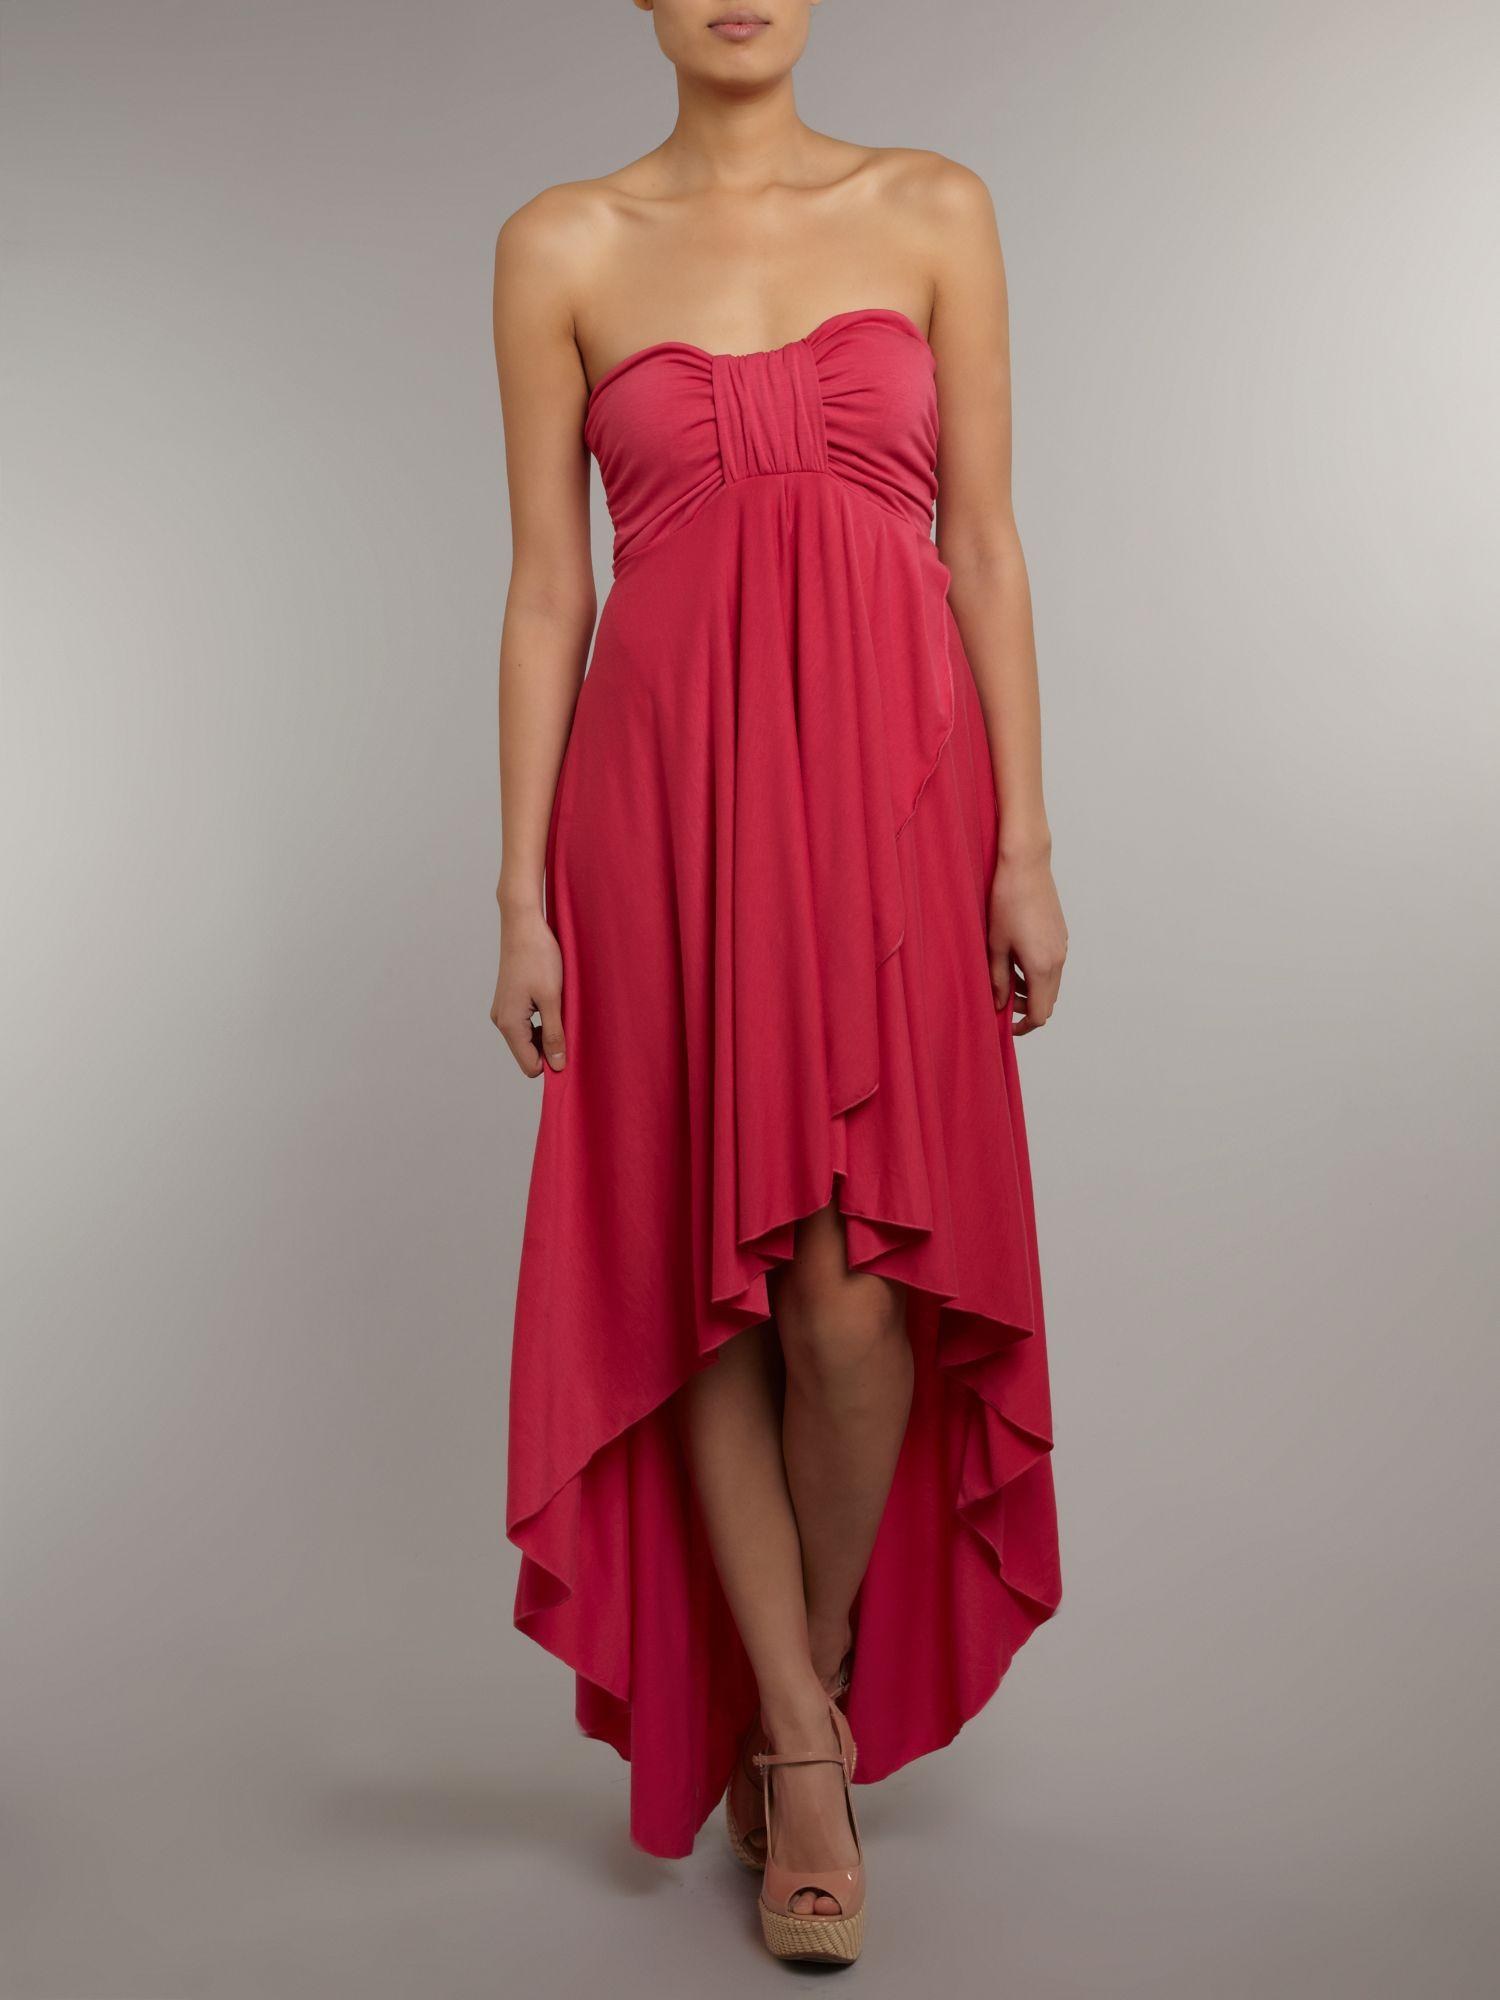 Izabel london waterfall hem maxi dress in pink lyst for Waterfall design dress